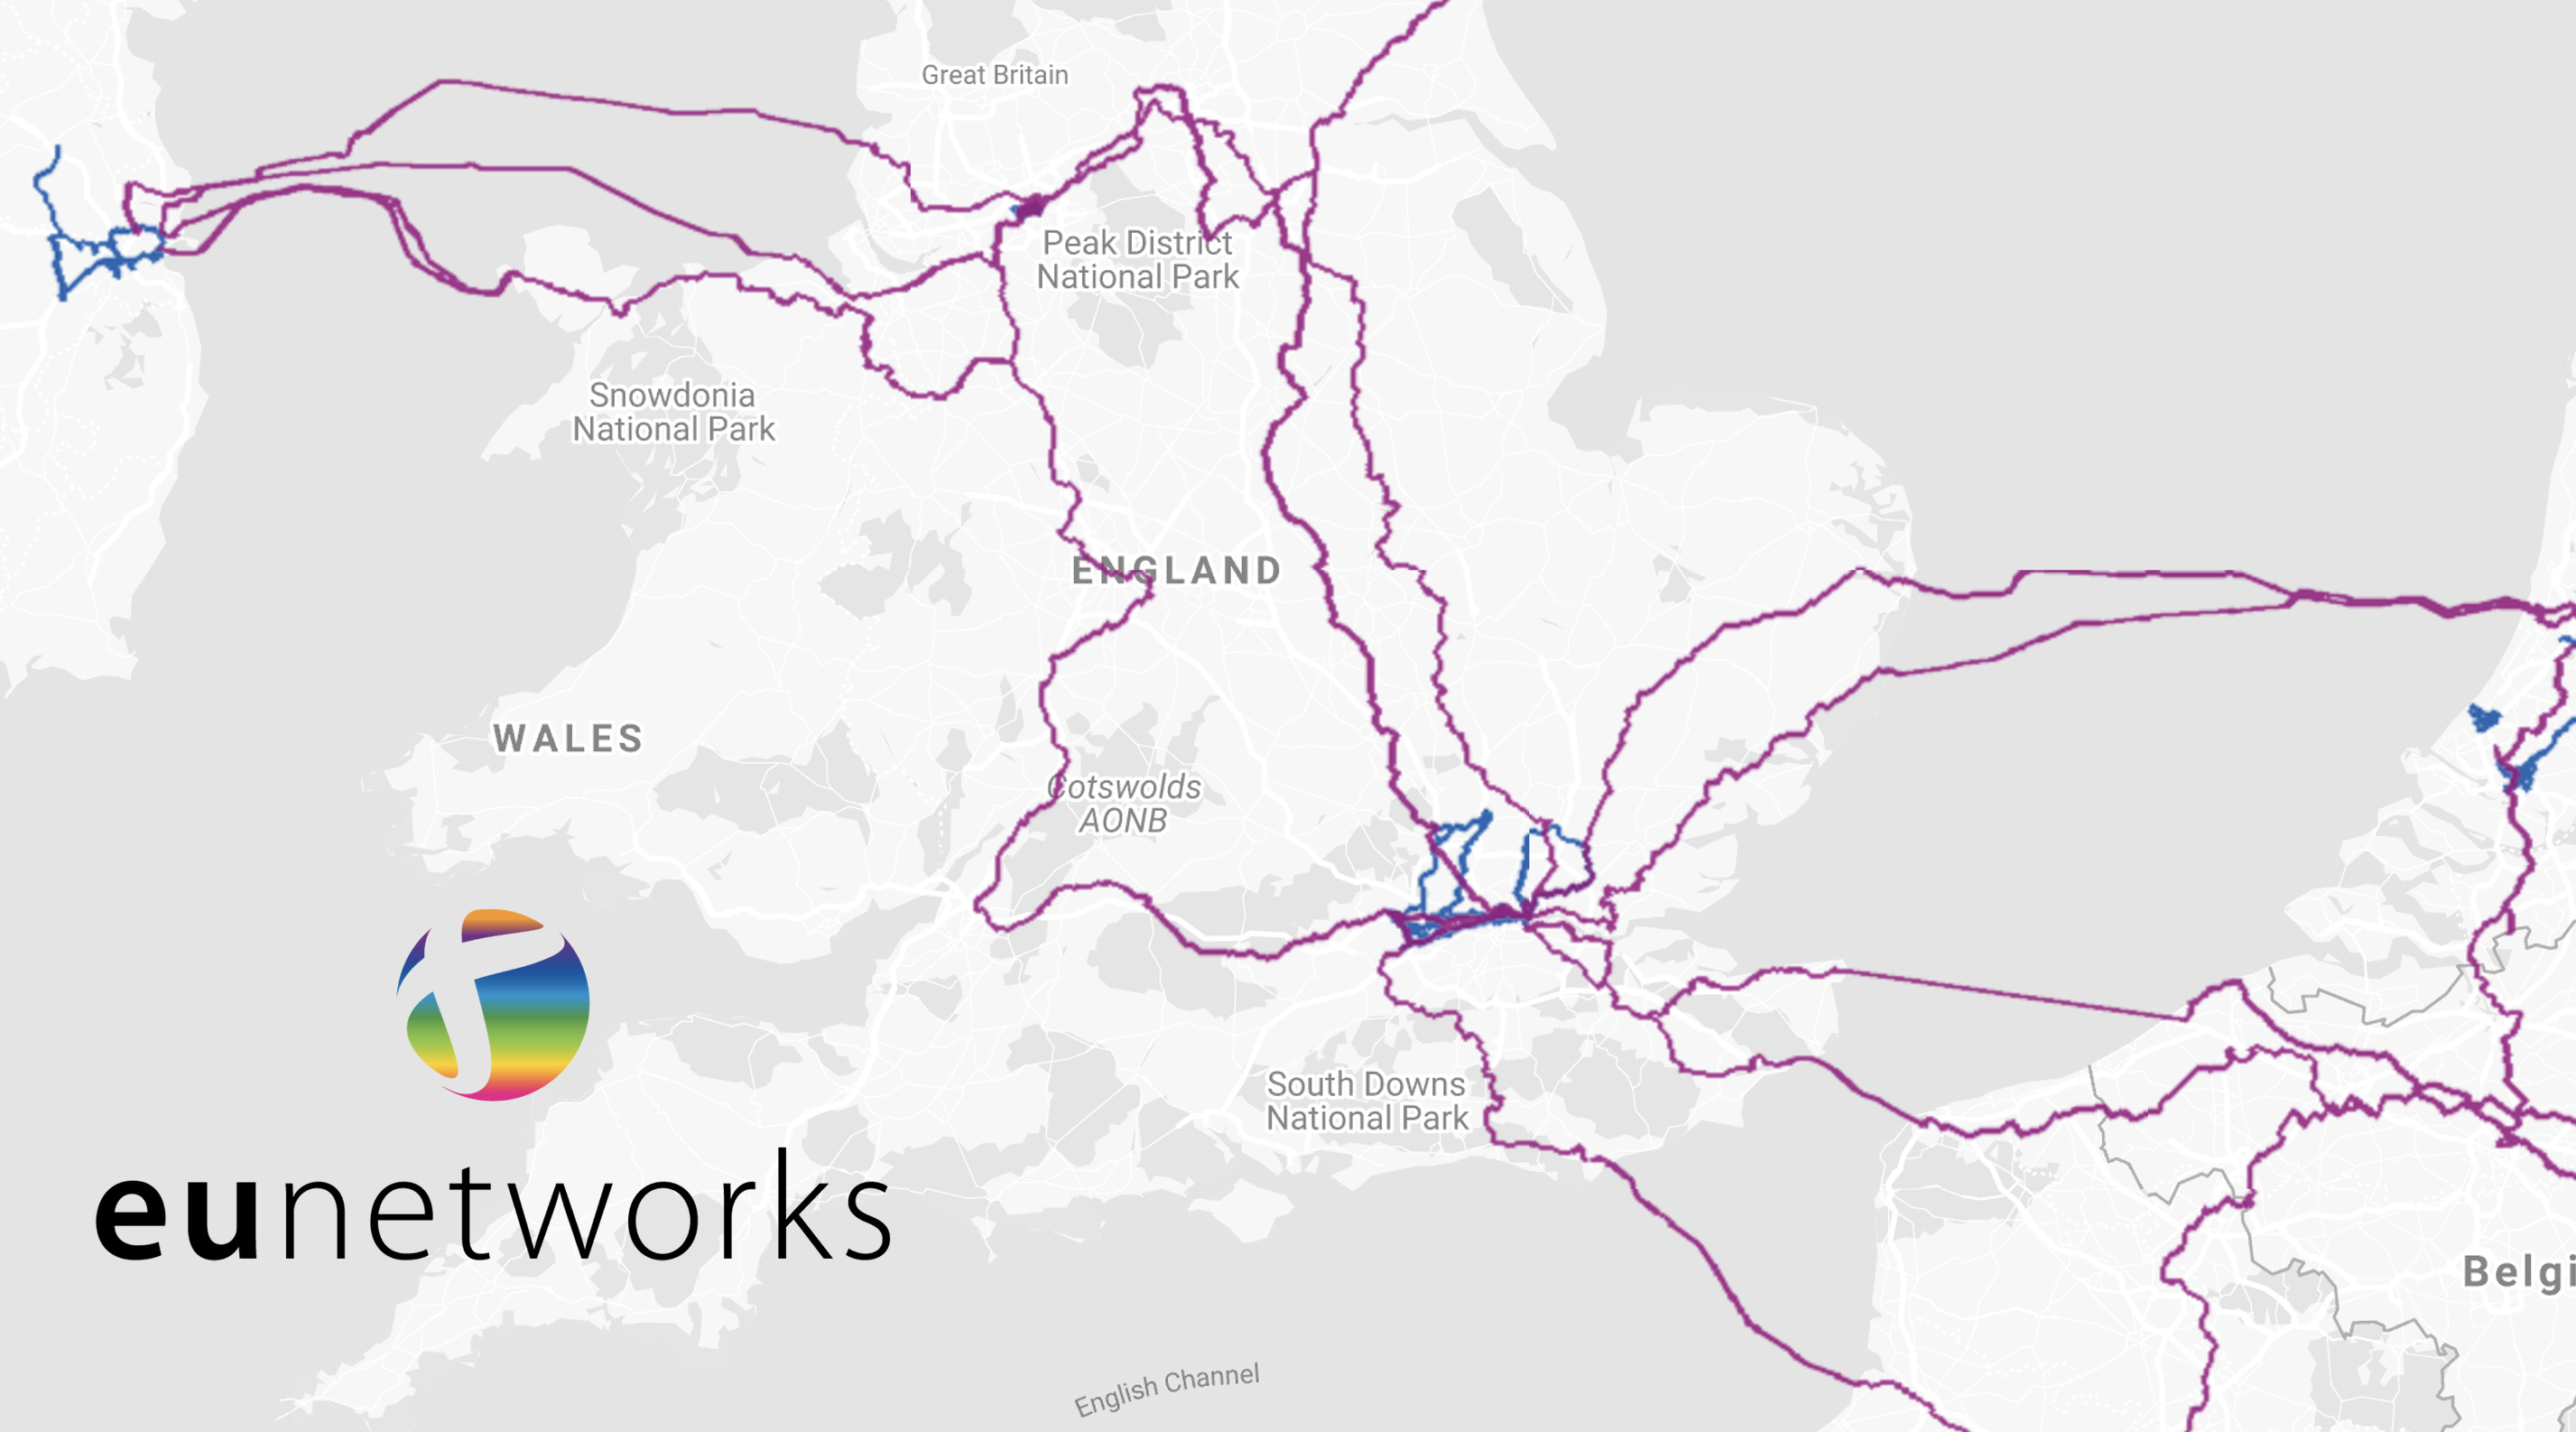 eunetworks connectivity map